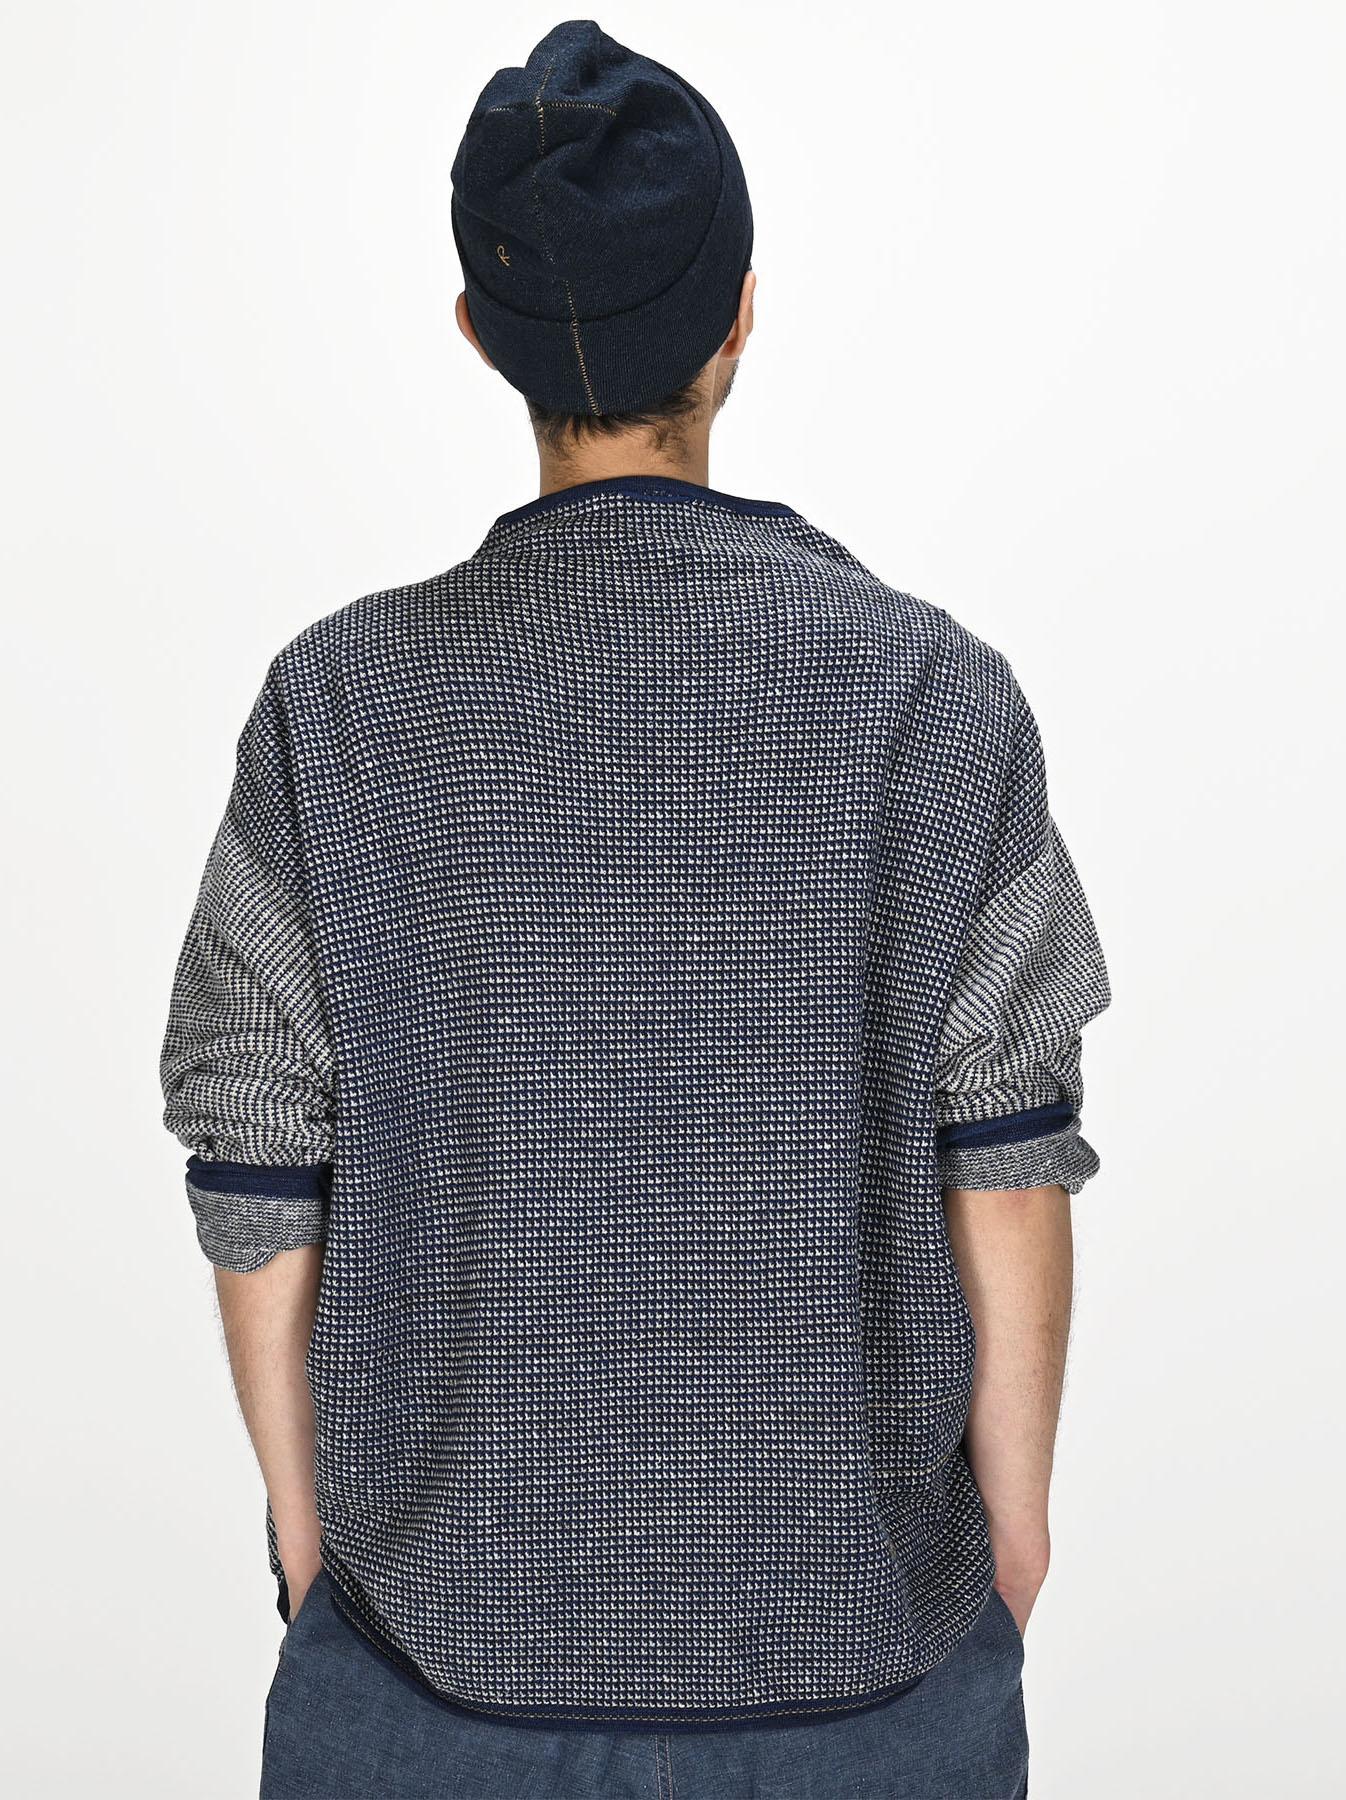 Indigo Tappet Kanoko Umahiko Sweater-7